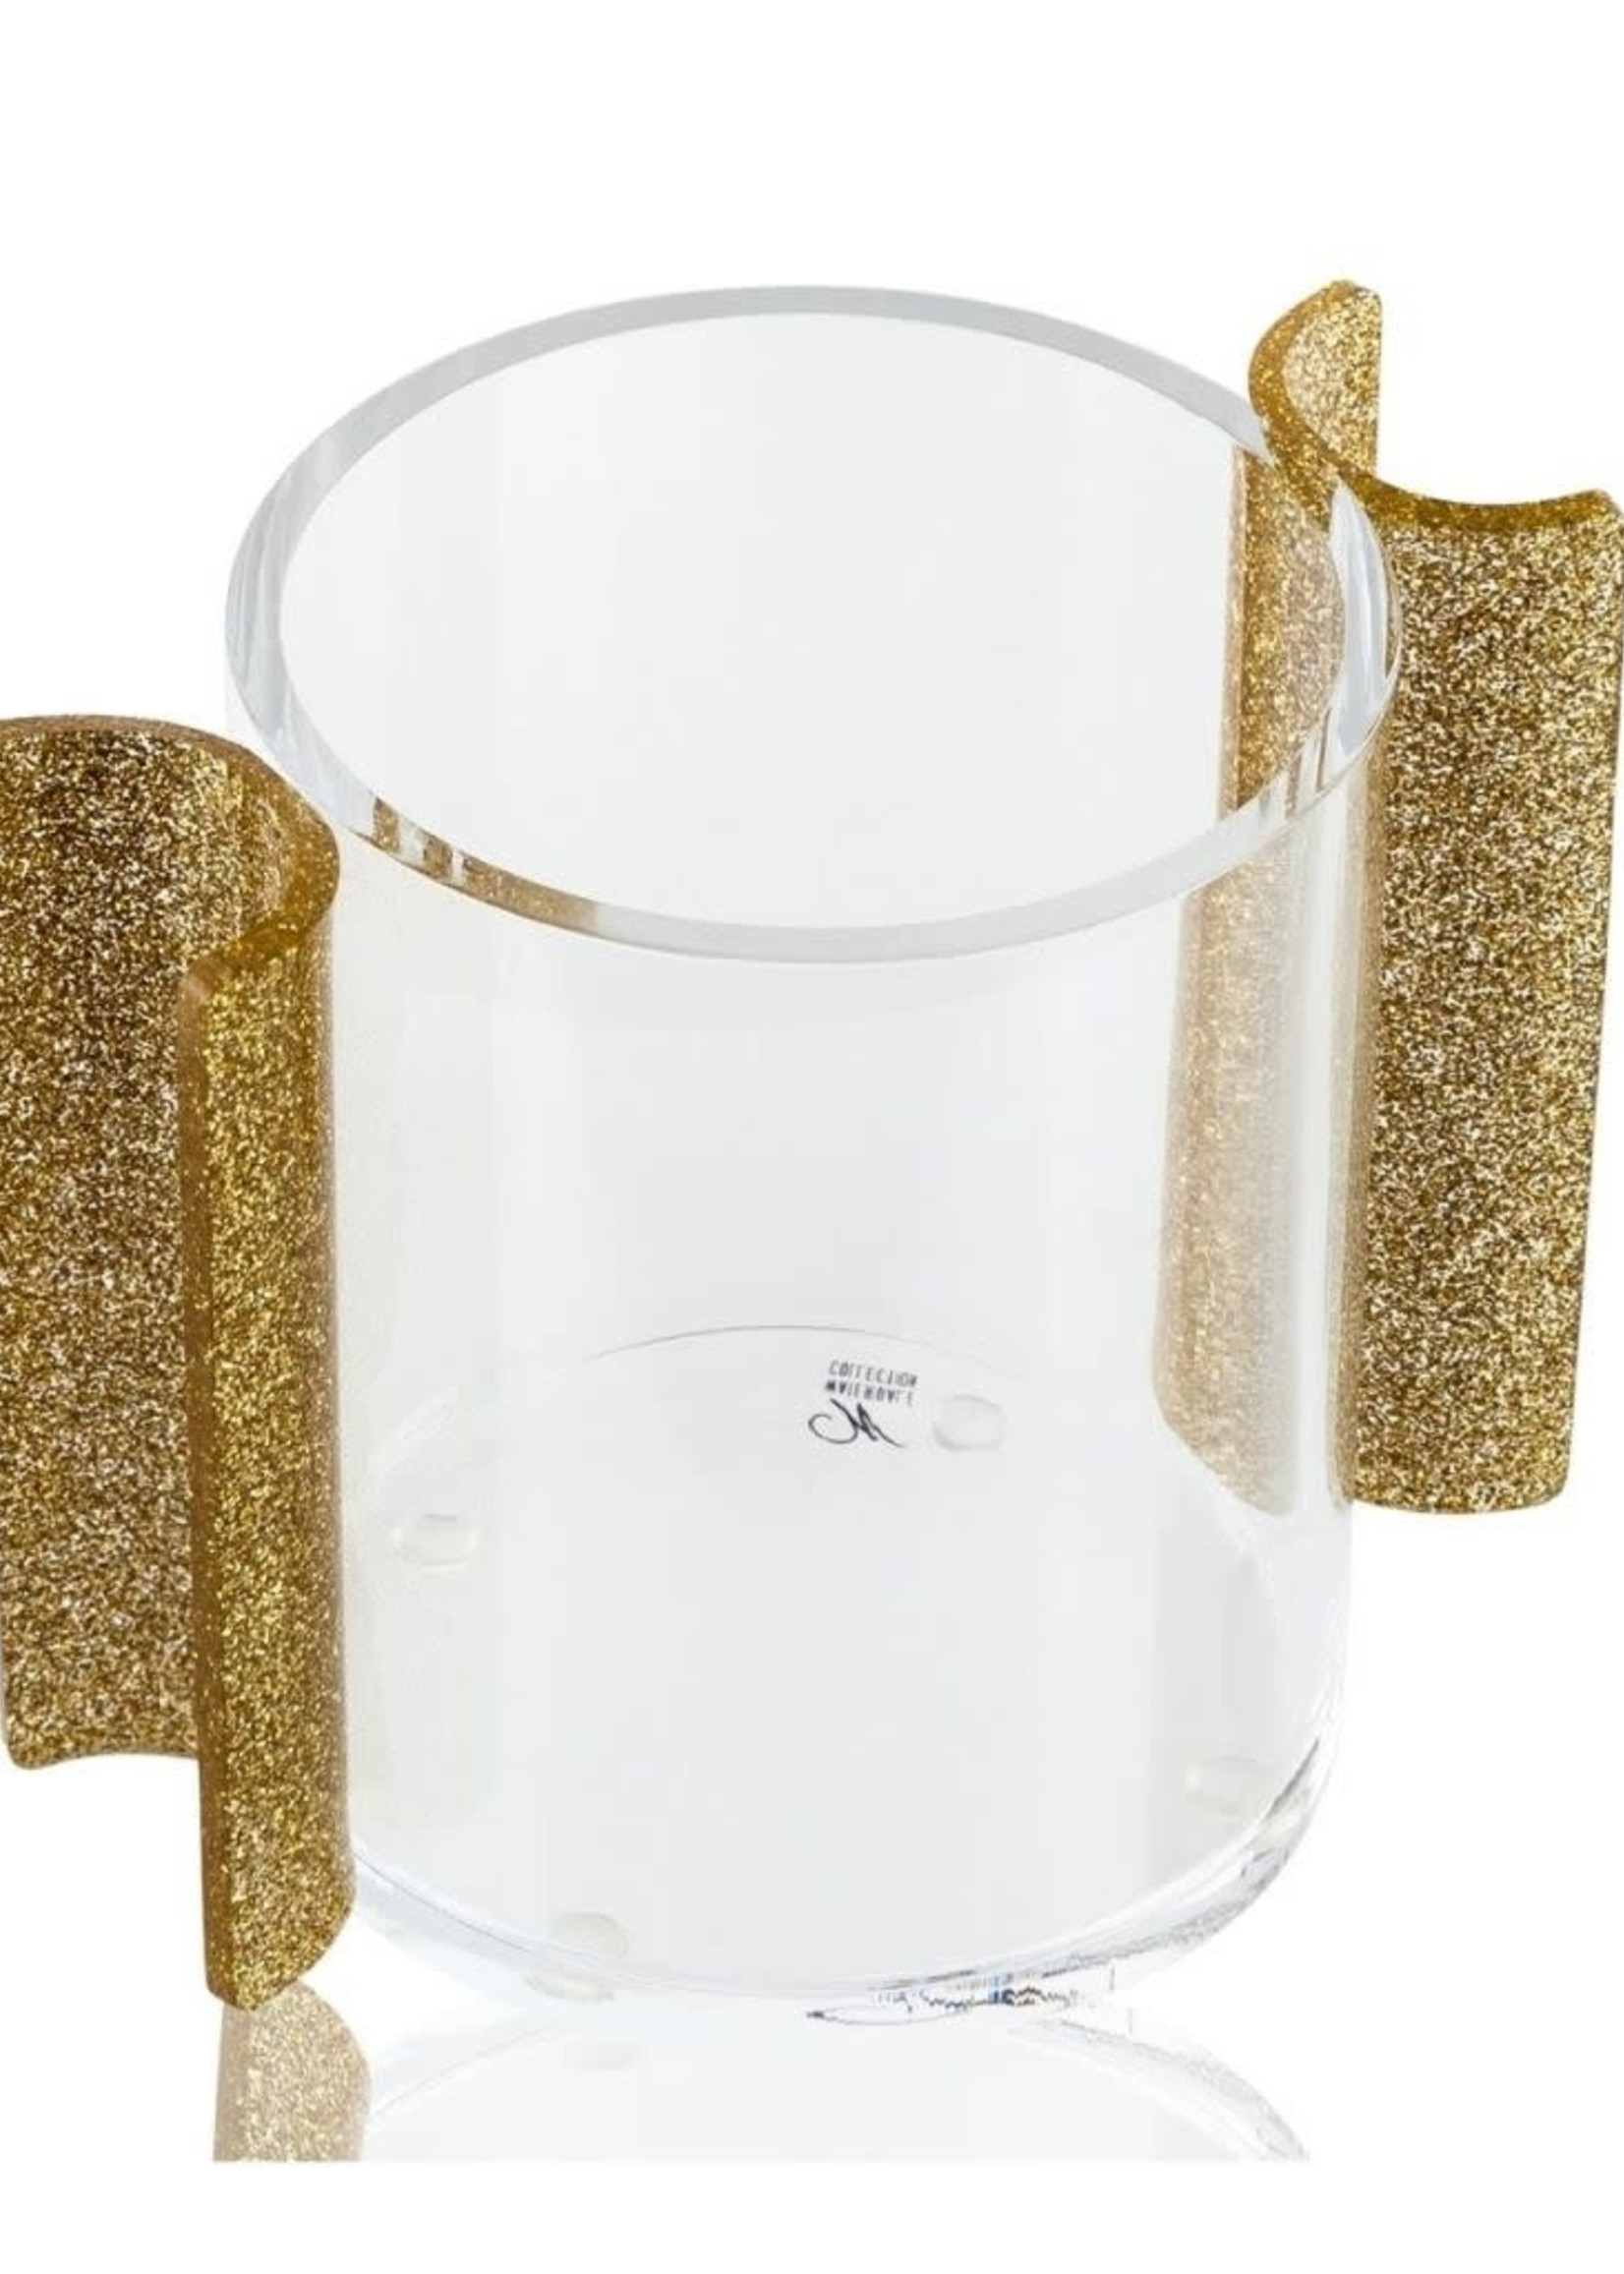 Round Washing Cup // Gold Glitter